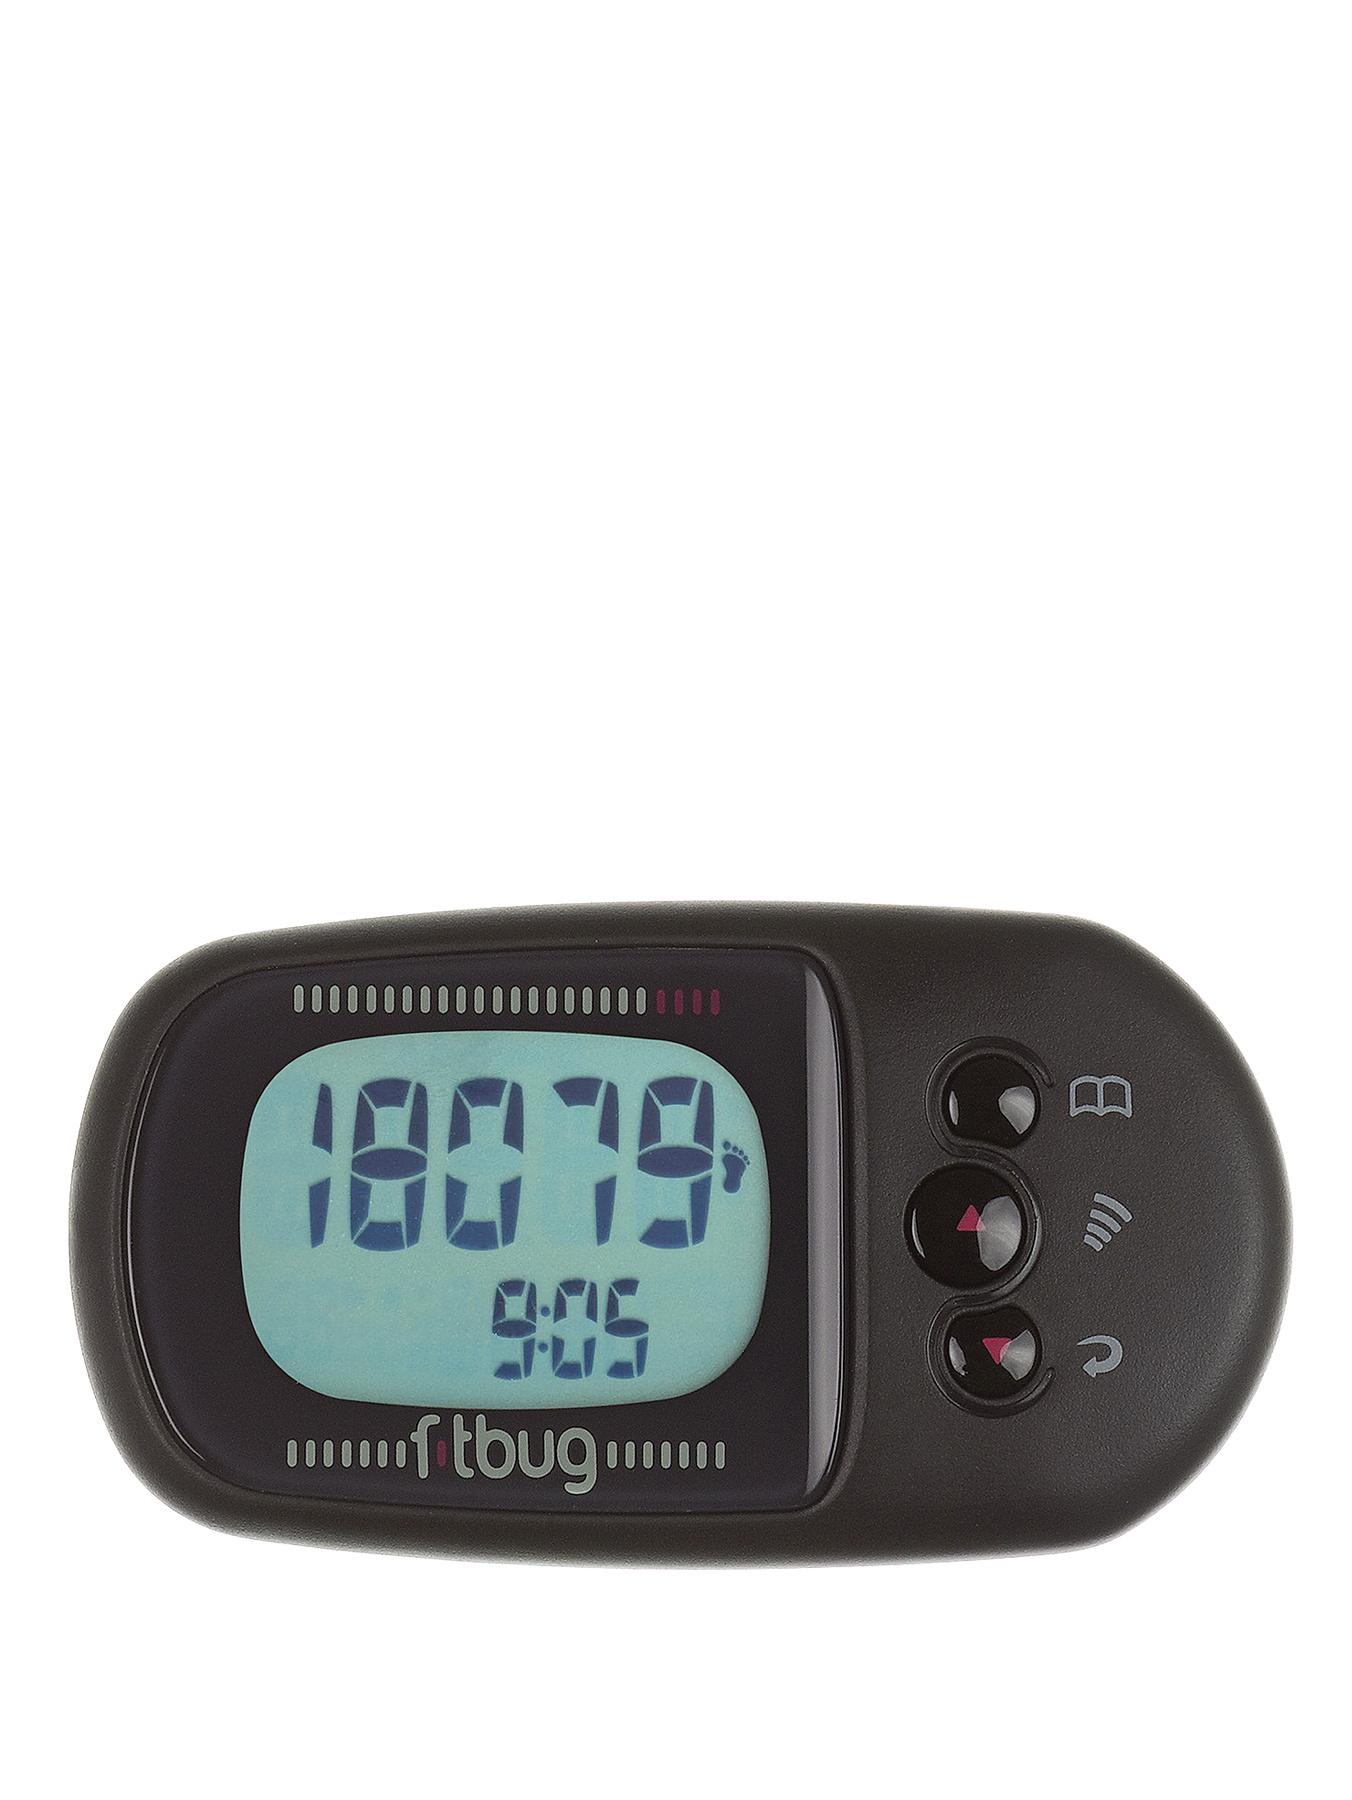 Fitbug Air Bluetooth Activity Tracker - Black - Black, Black